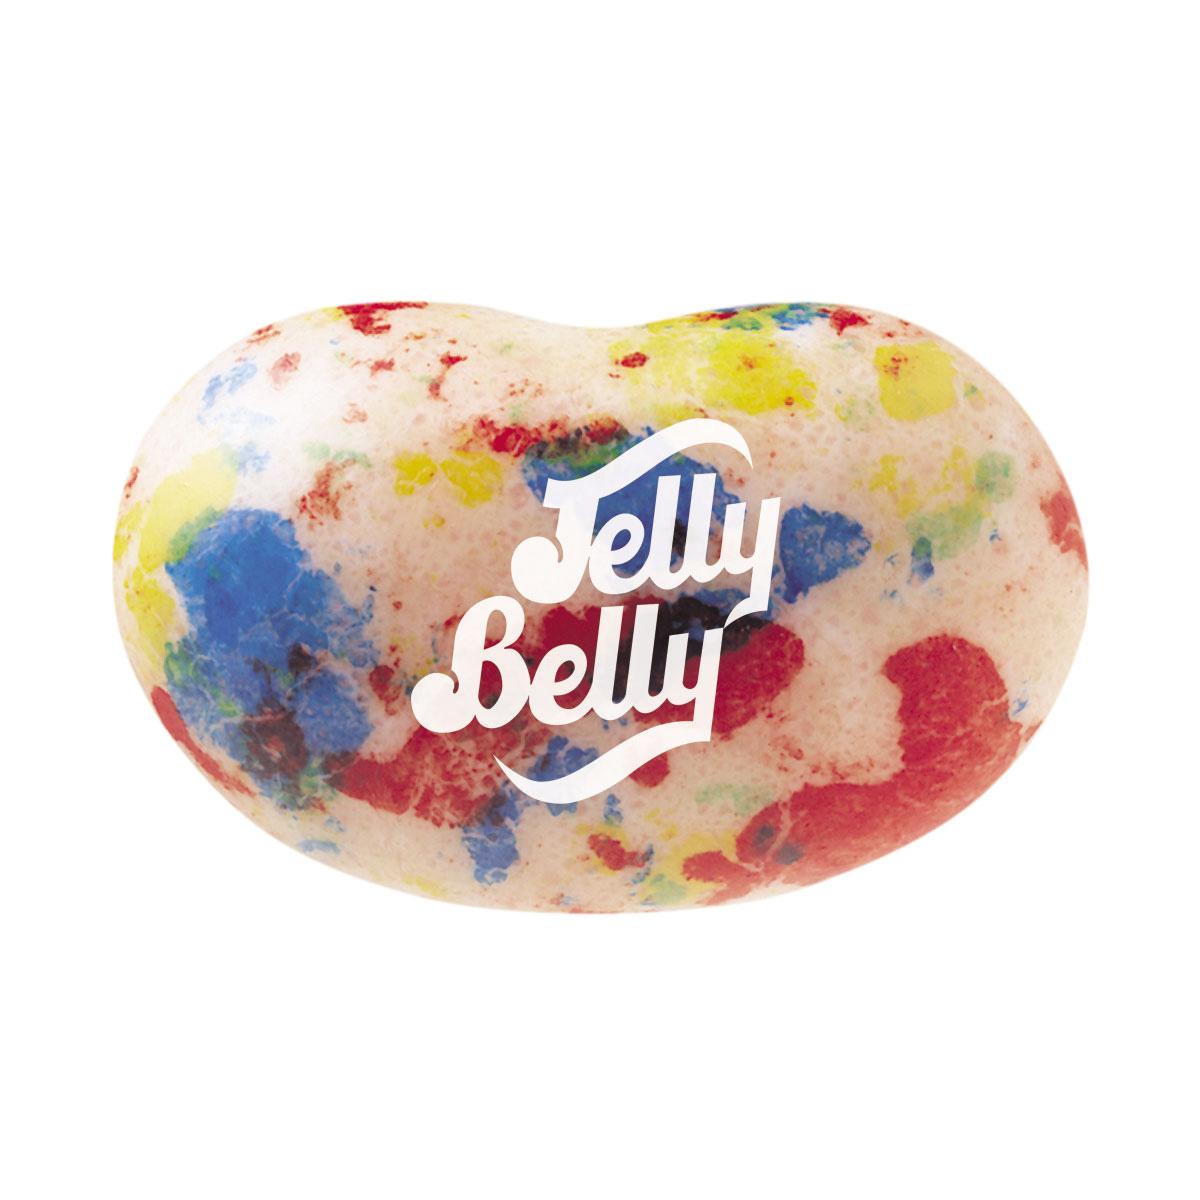 bf89258c82a Tutti-Fruitti Jelly Beans – 16 Oz. – Re-sealable Bag